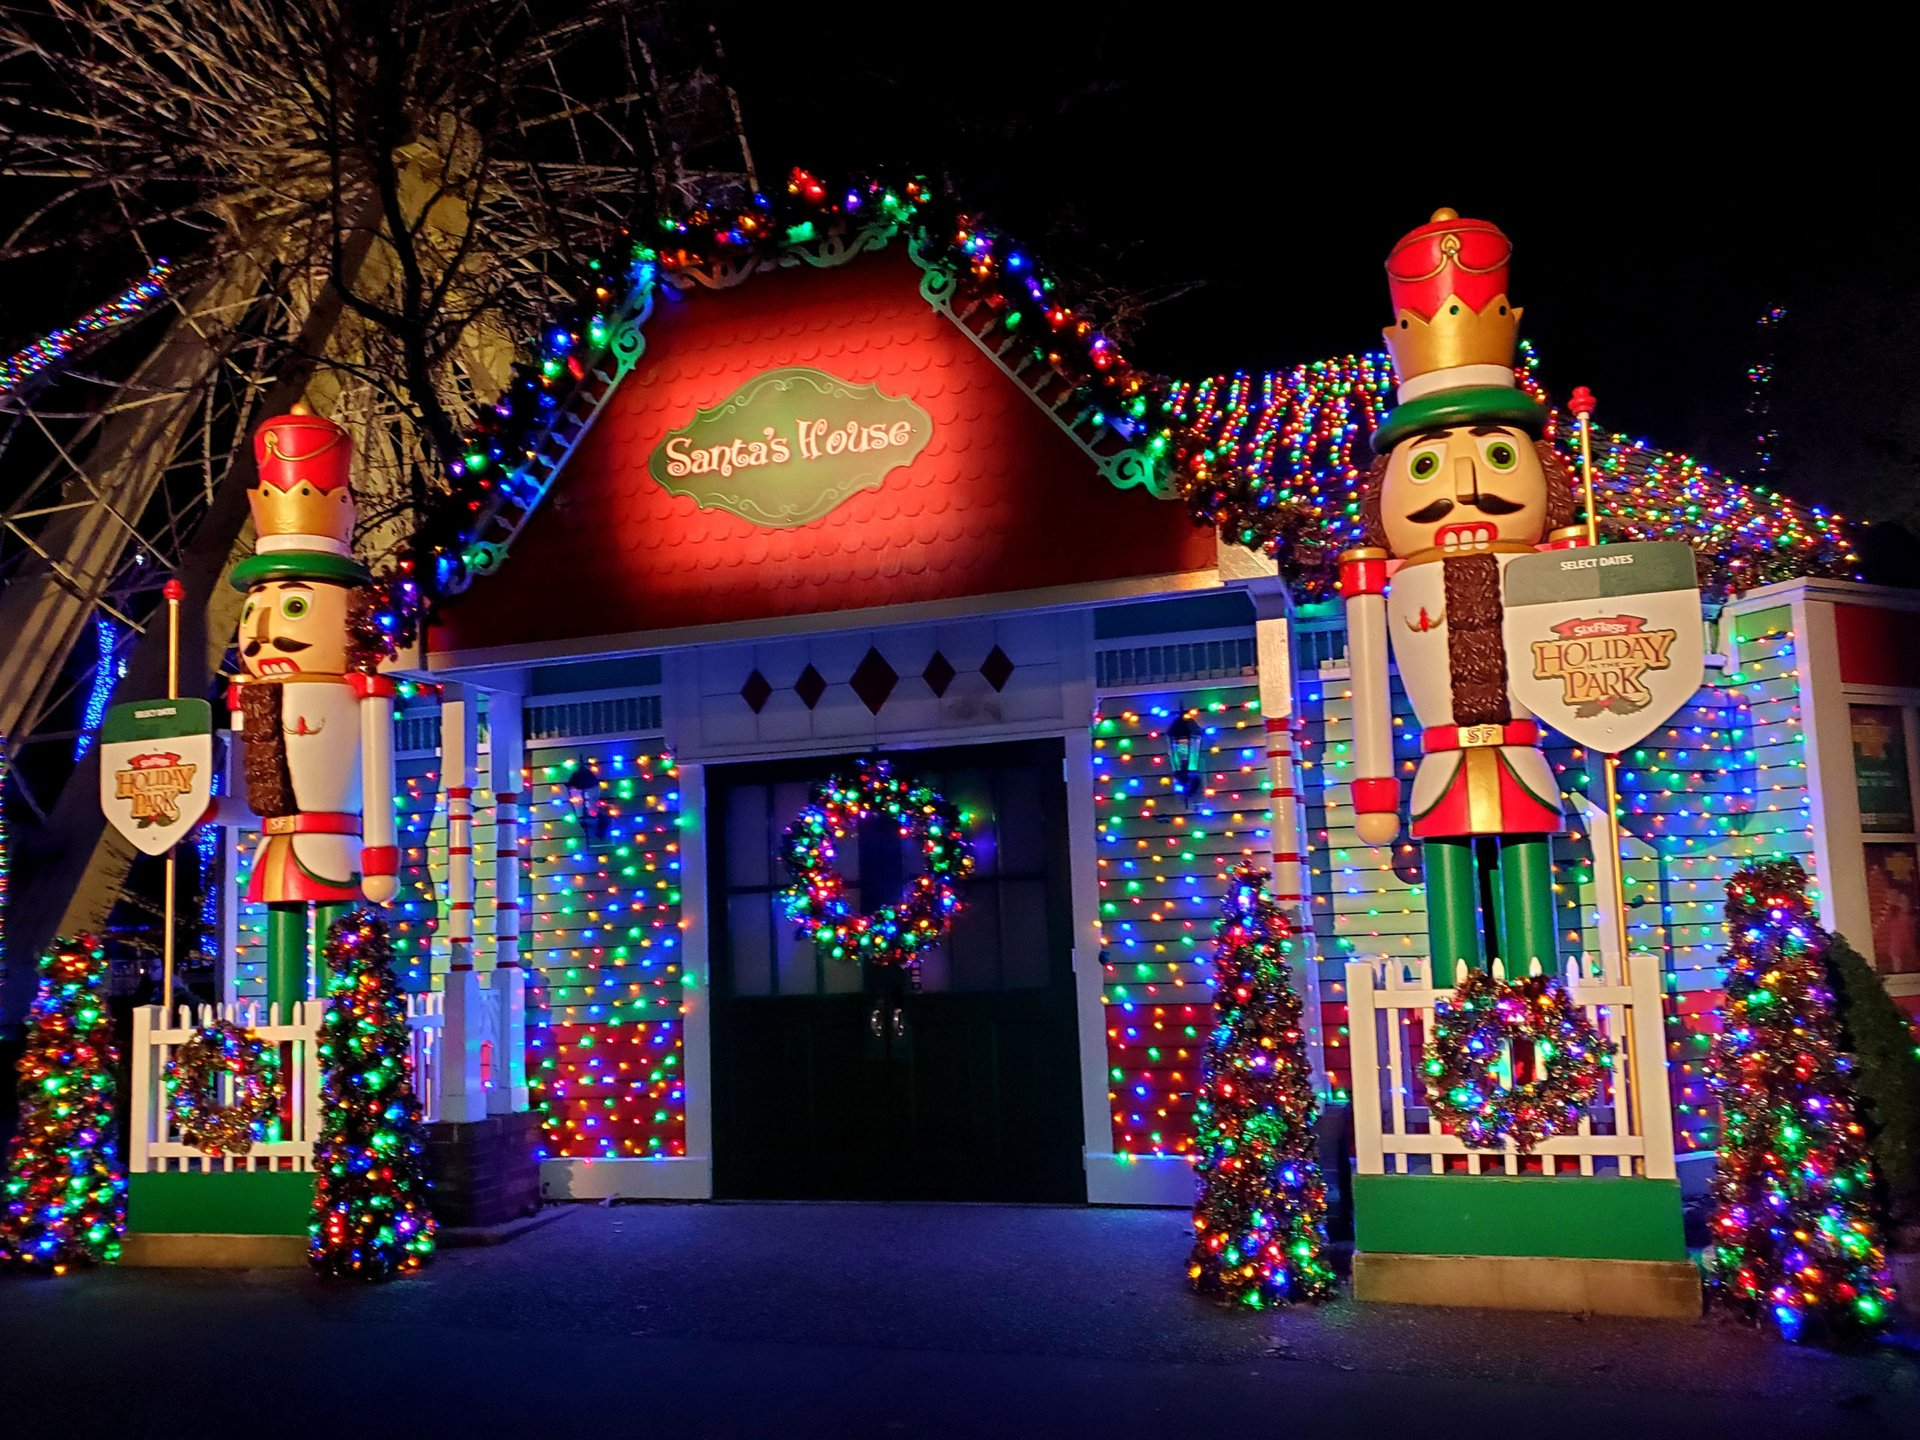 North Pole Santa's House